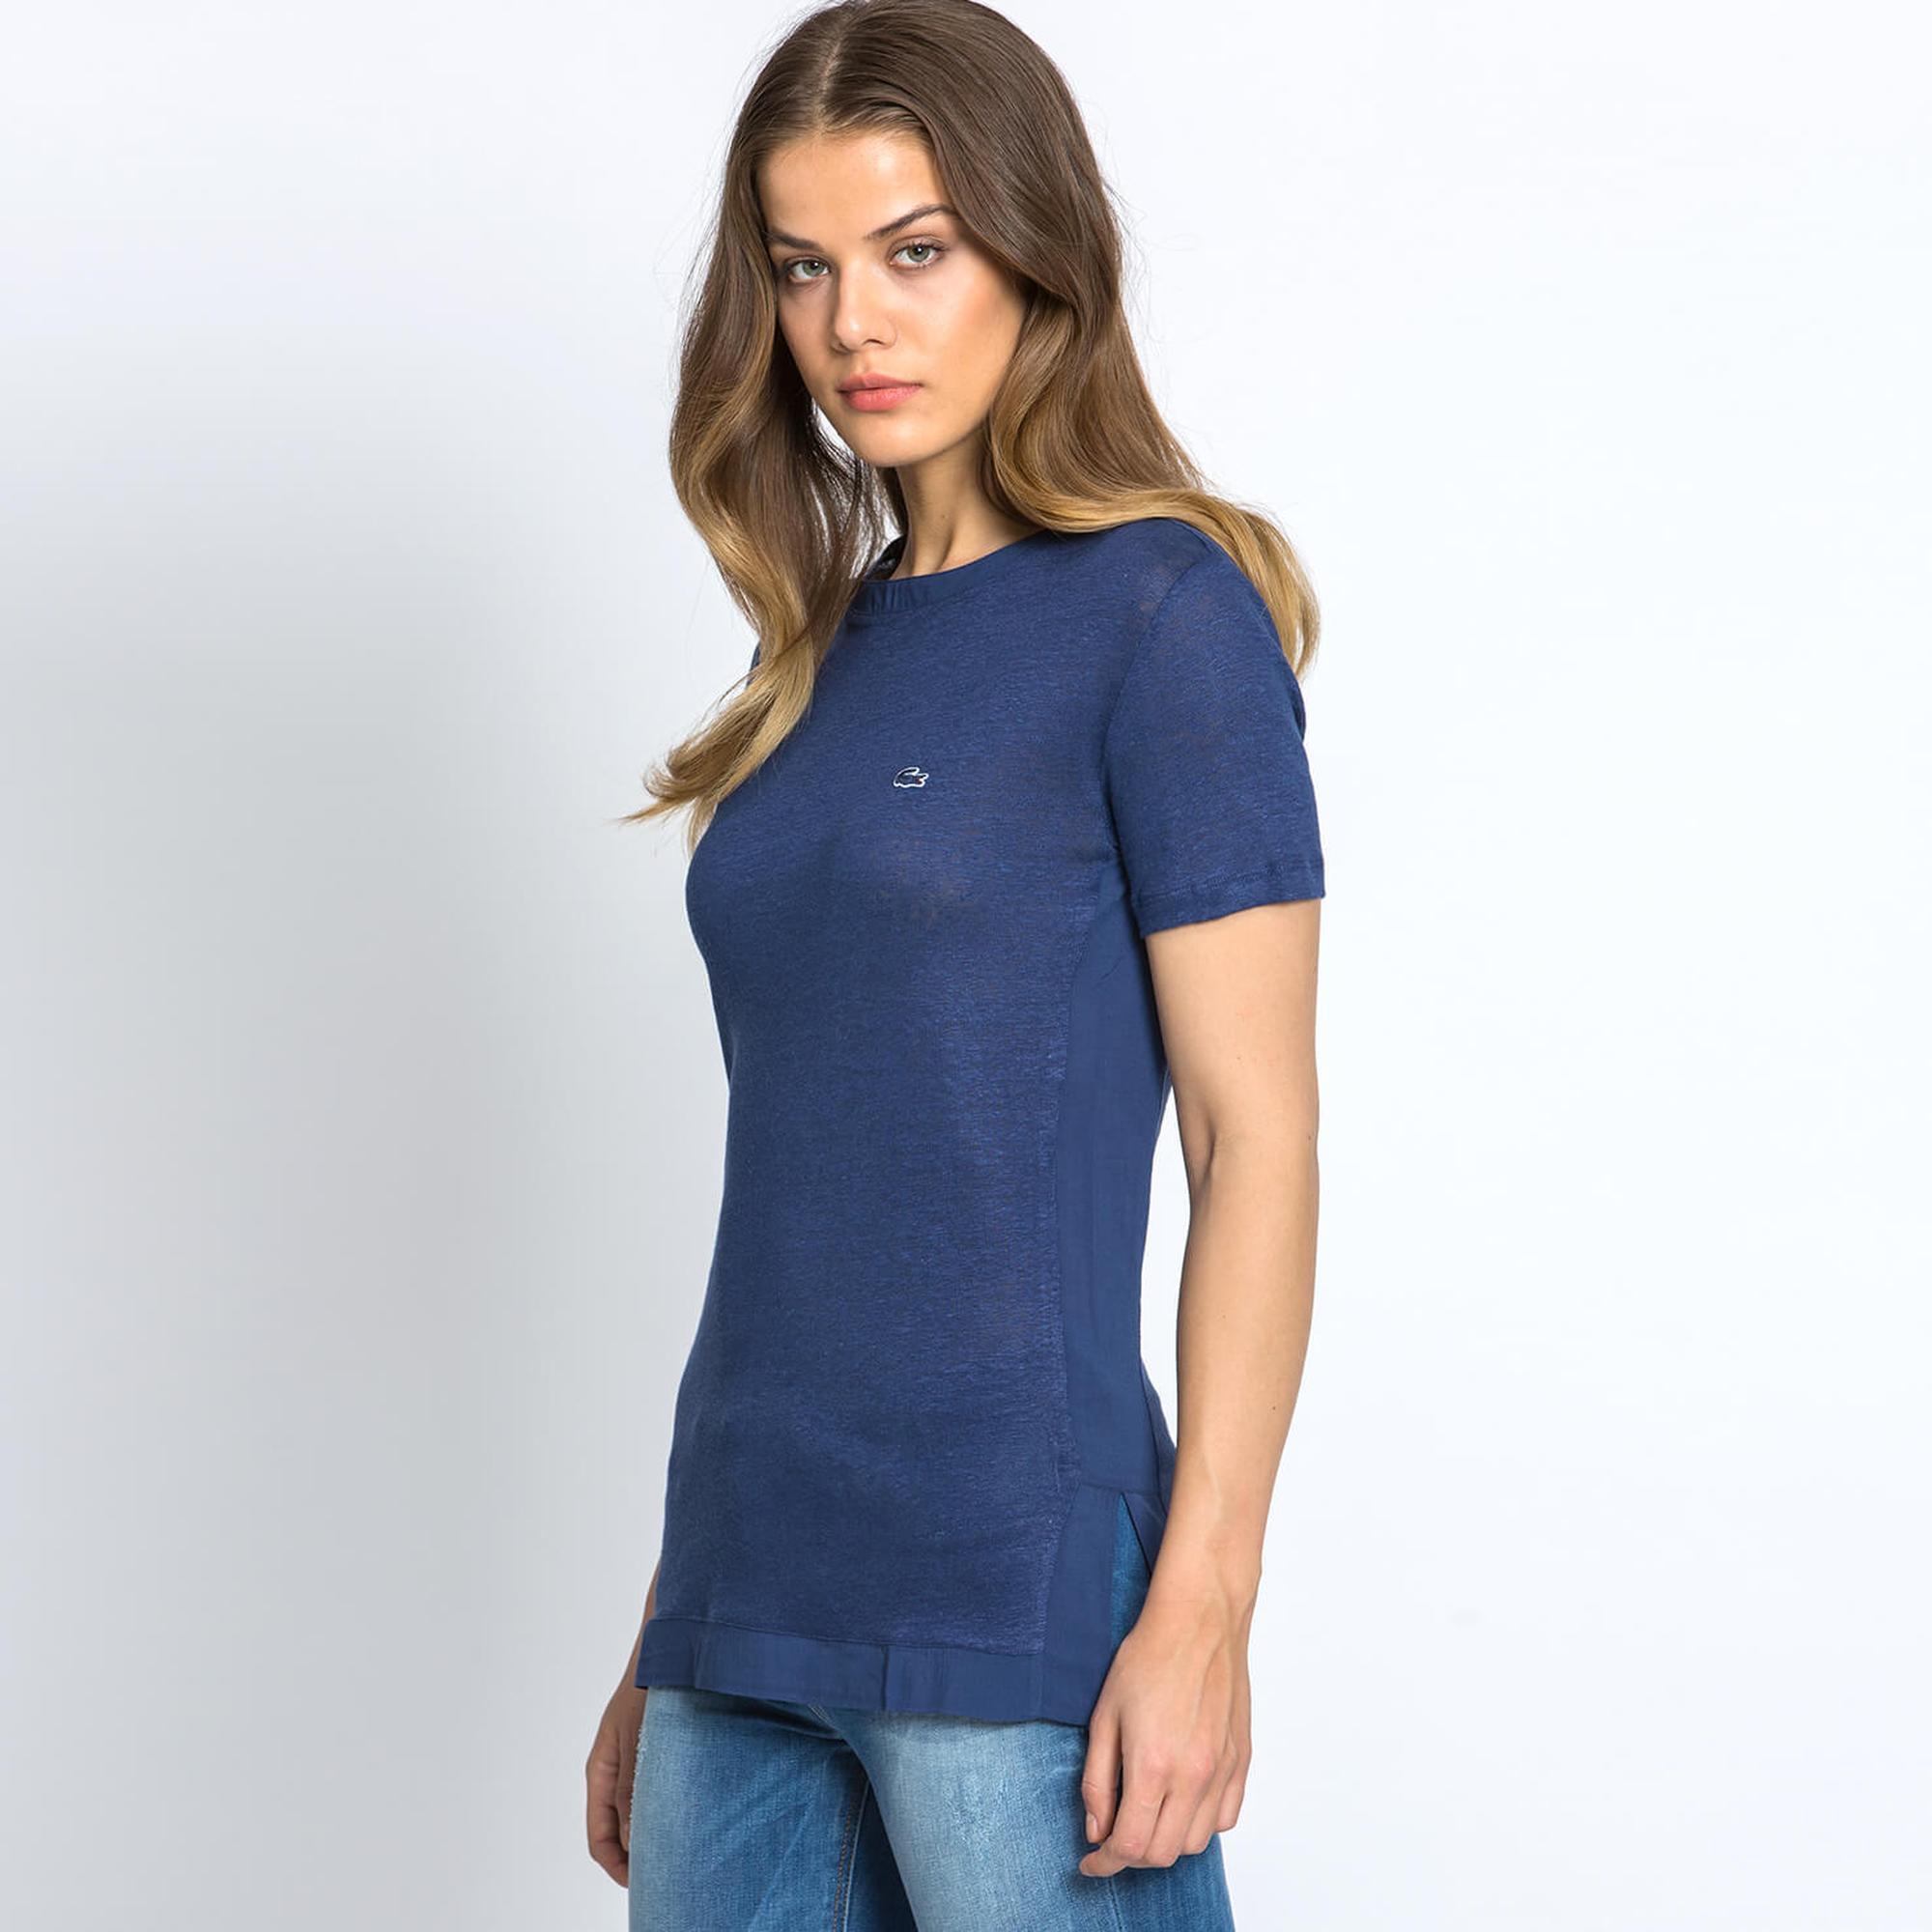 Lacoste Damska koszulka